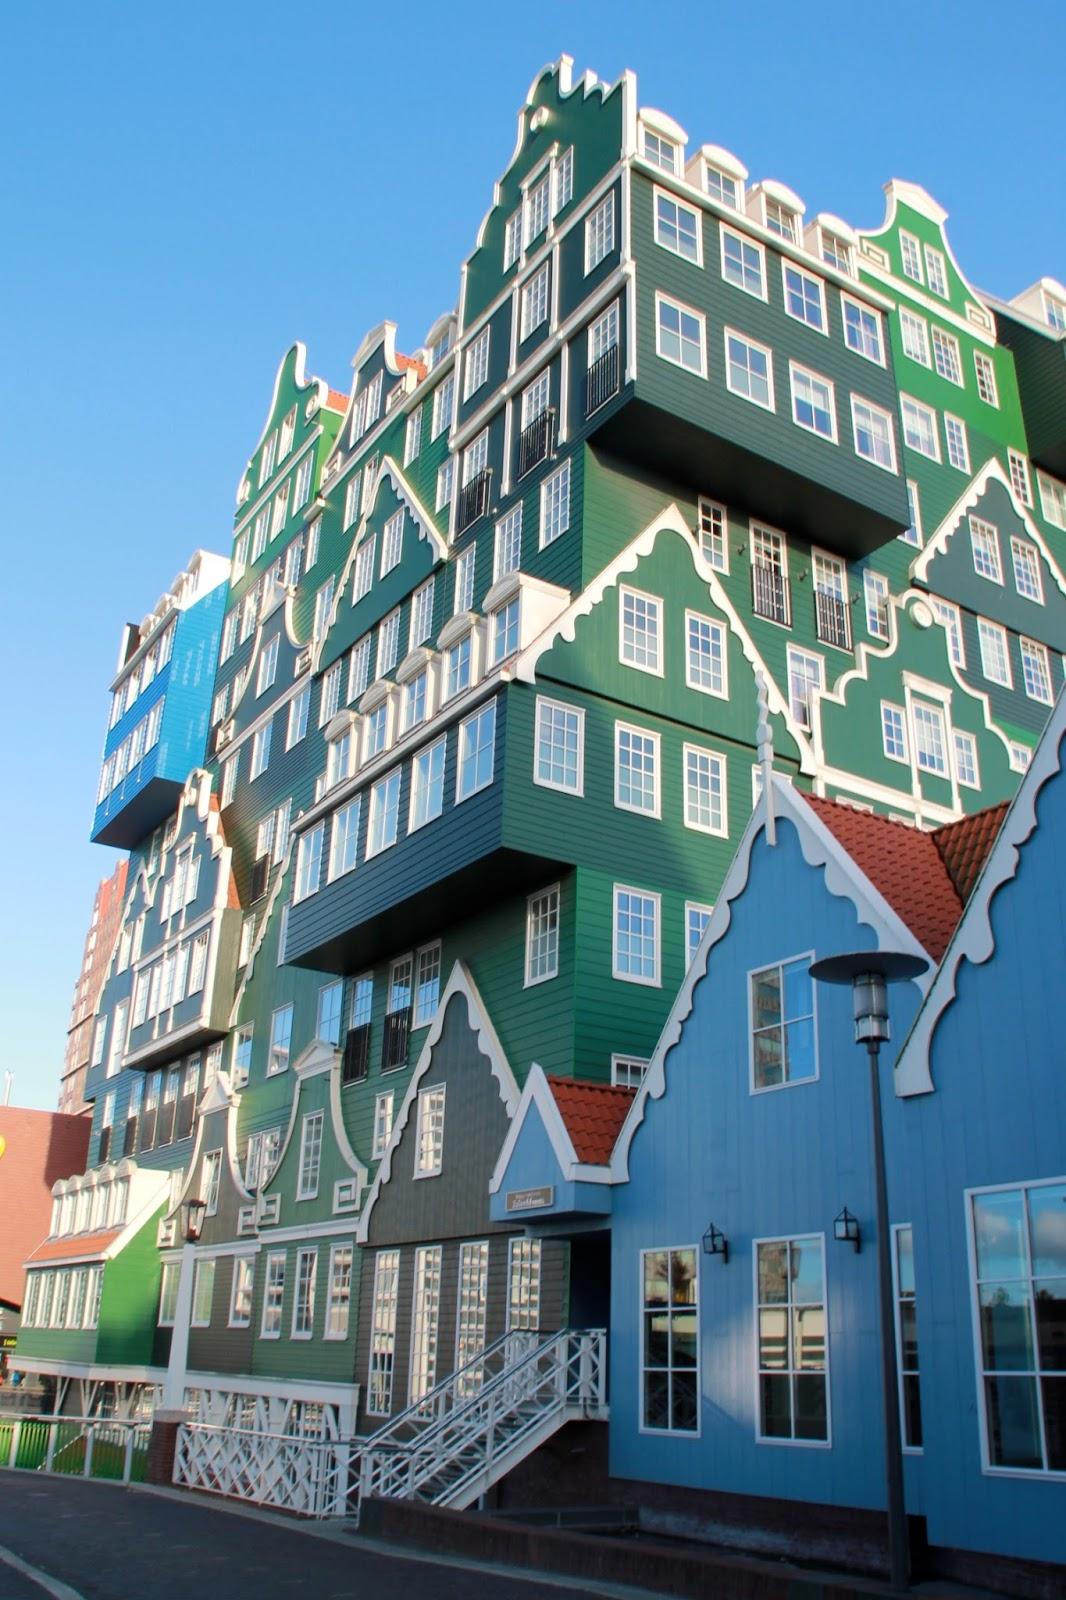 Zaandam, The Netherlands